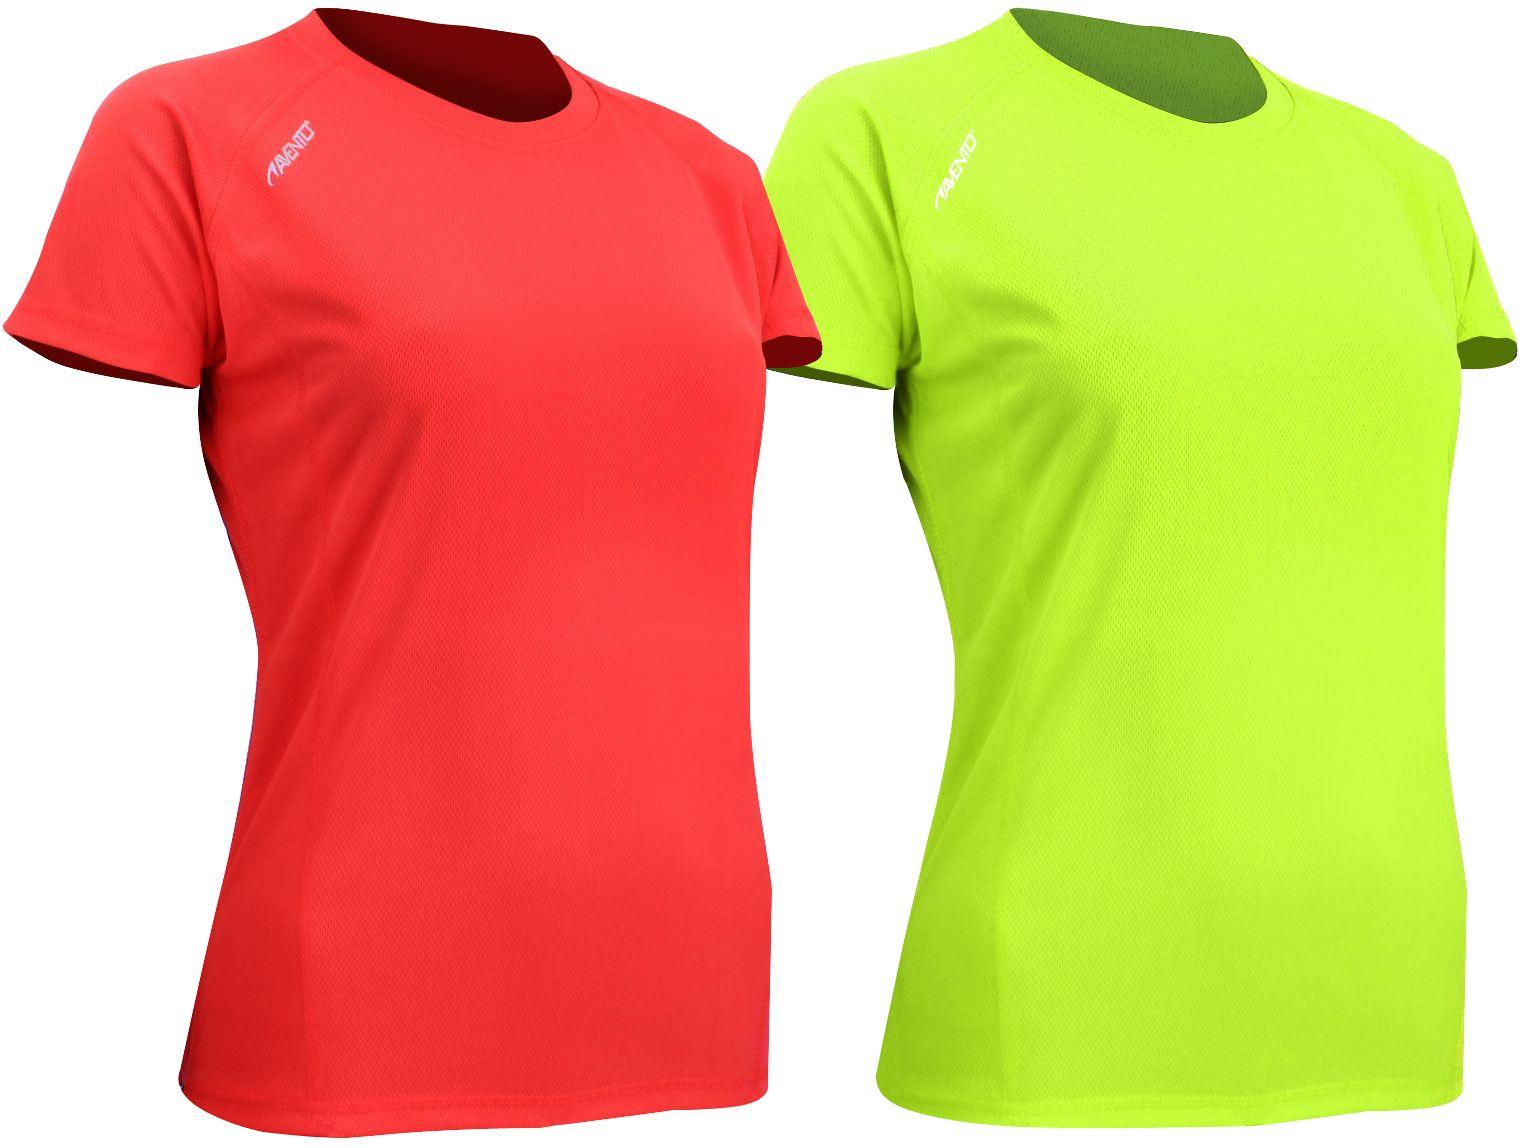 online retailer 940cd c8e0c 74PV - Sporttrikot • Damen • - Design, development and trade ...